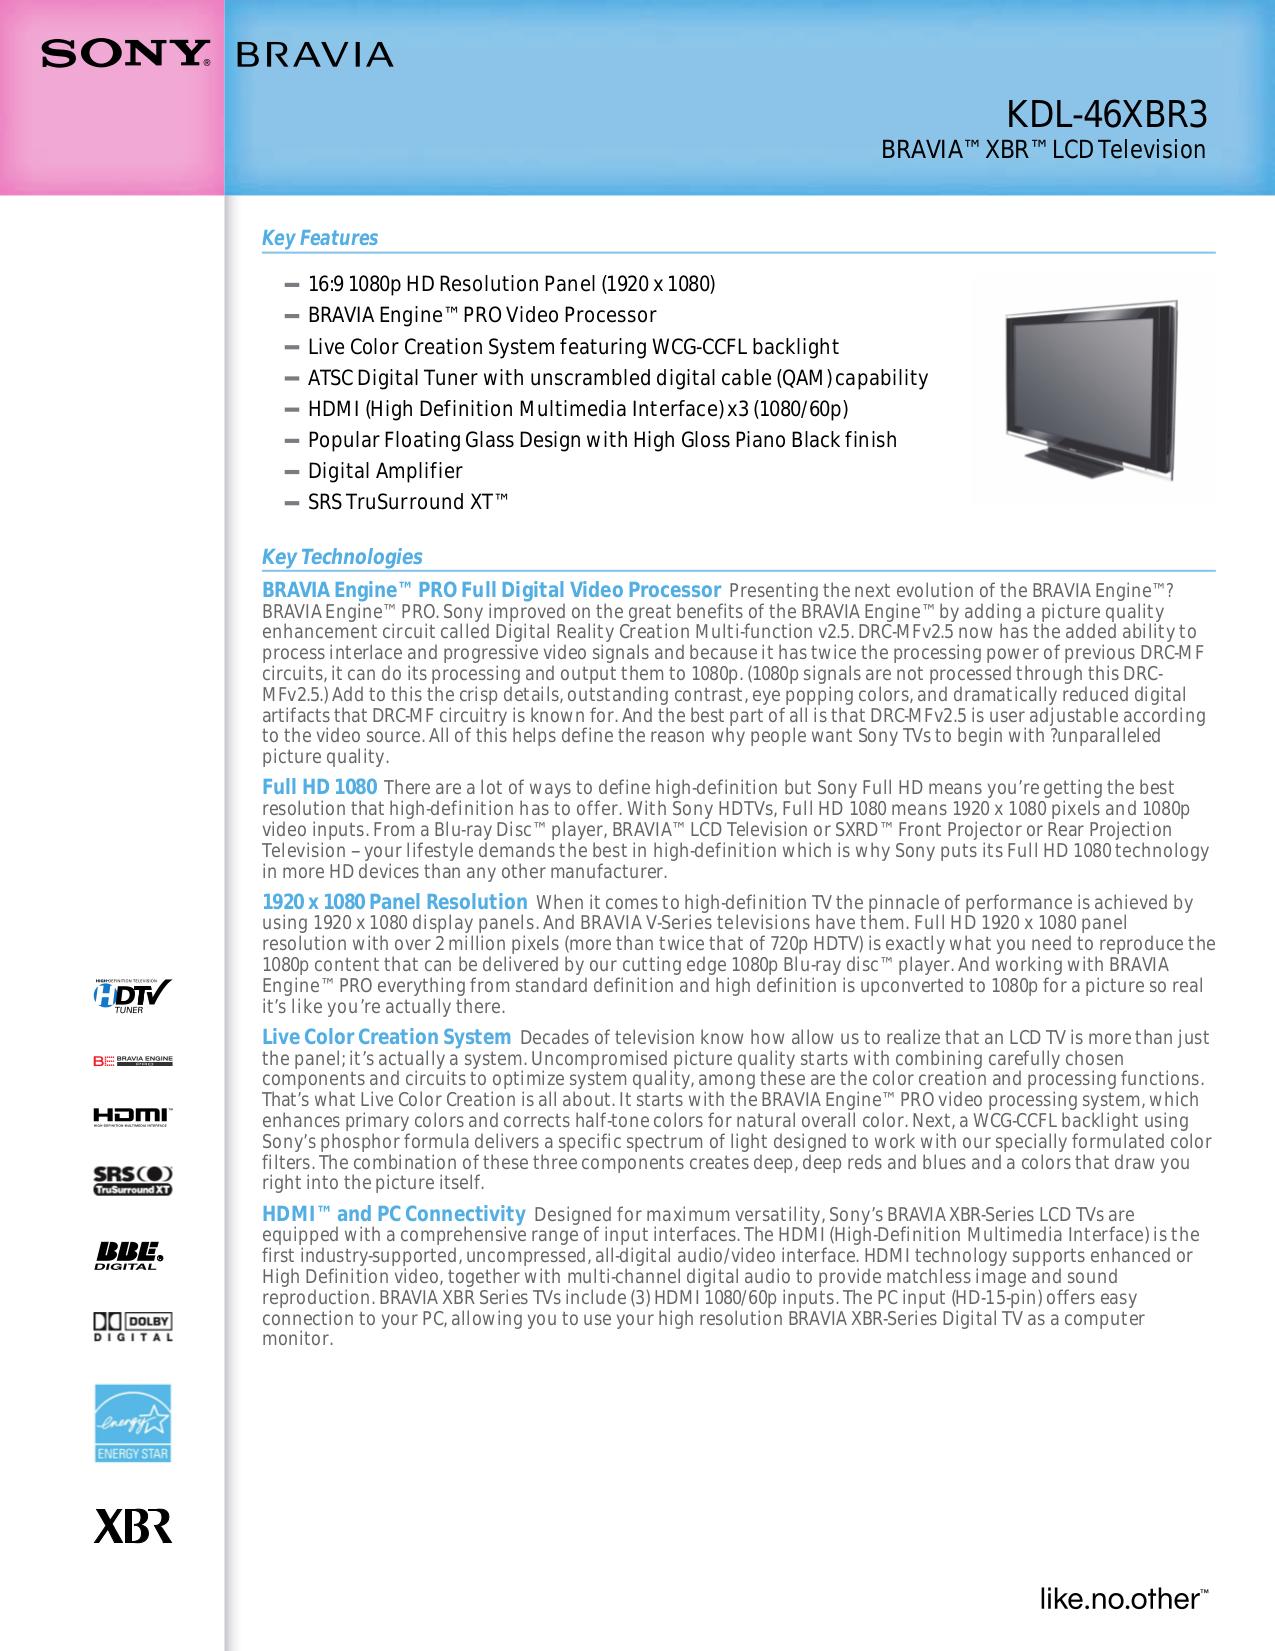 Ford Fuse Box Connection Ip Schematics Wiring Diagrams 1920 Pro Hdx Qam Diagram U2022 Gsmx Co 2007 Edge 2006